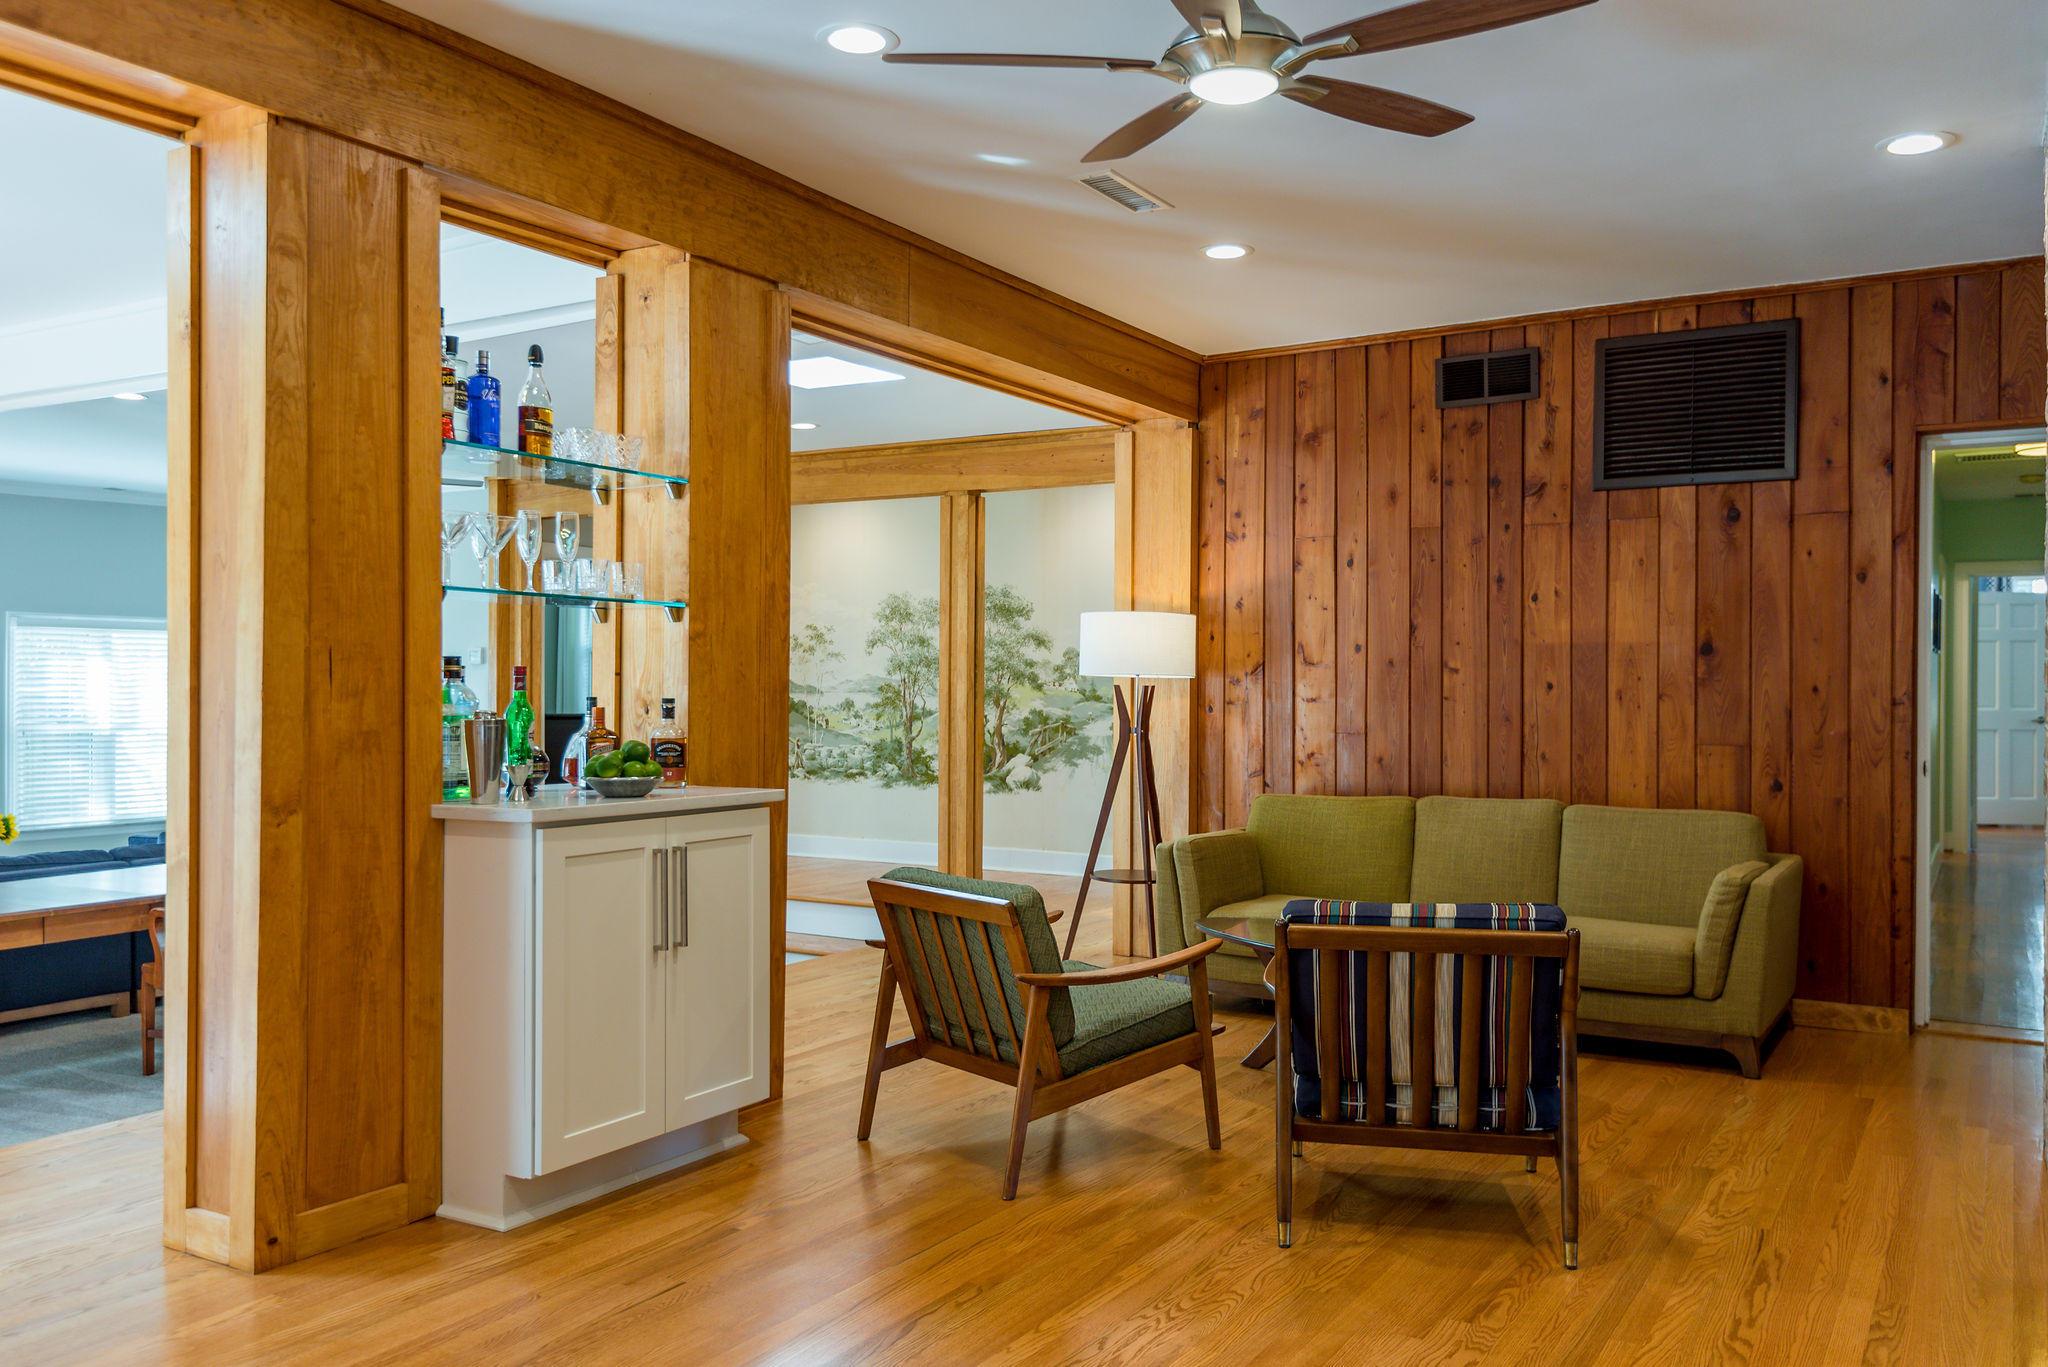 Sylvan Shores Homes For Sale - 450 Polony, Charleston, SC - 17